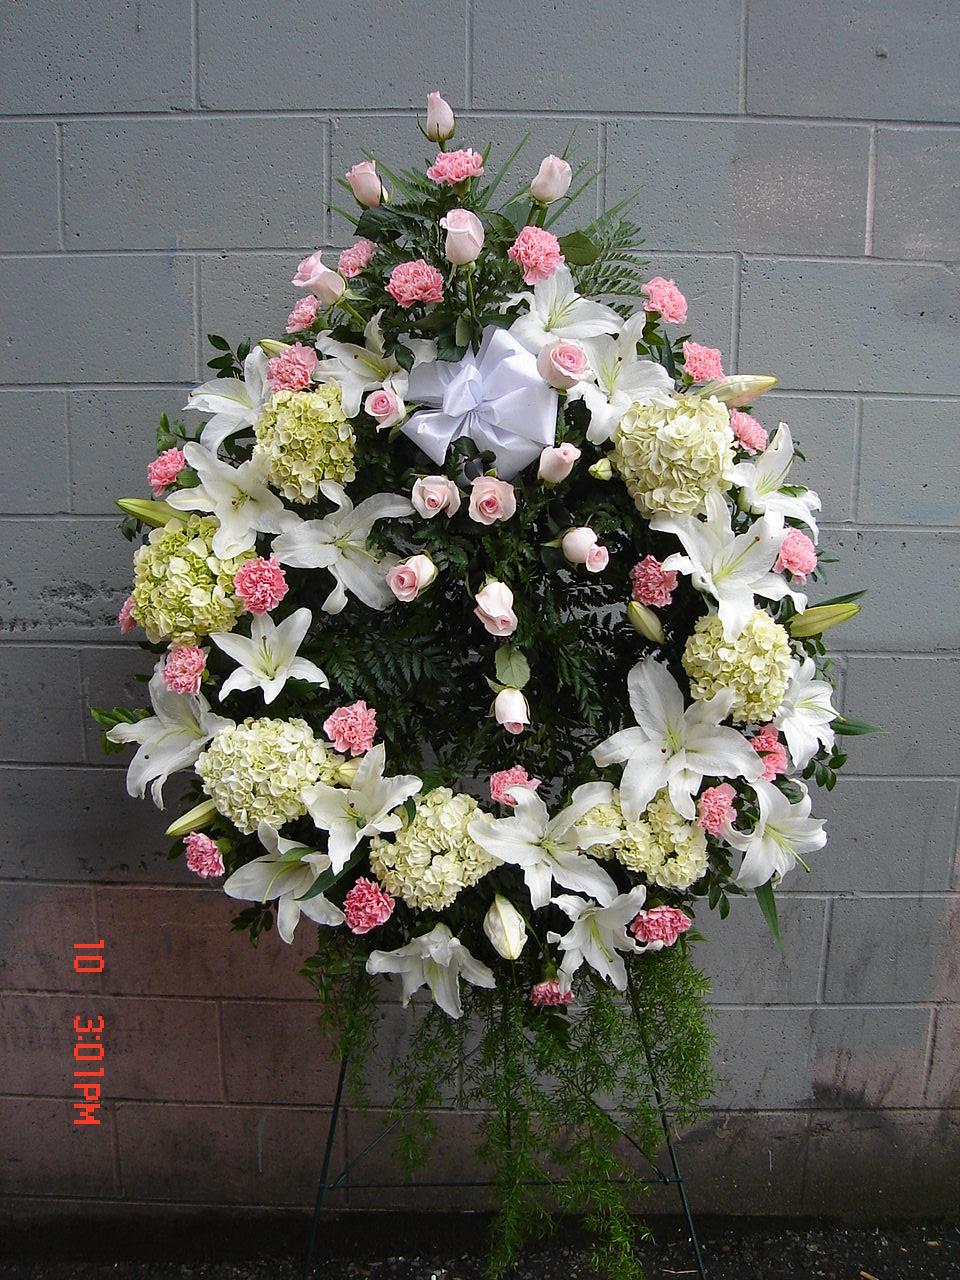 Pink & White Spray within Wreath